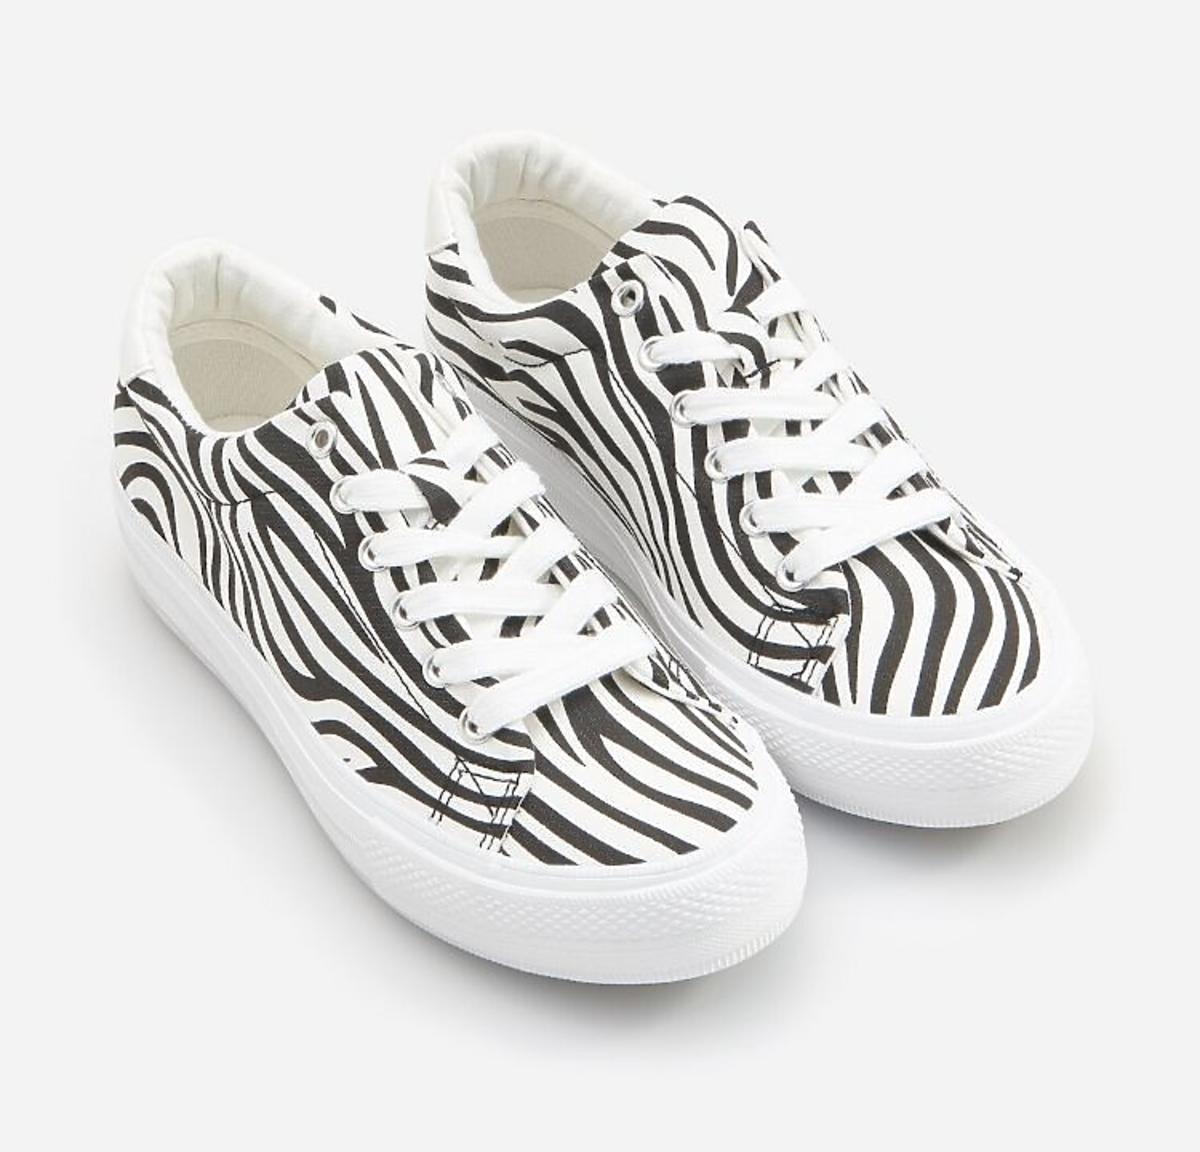 Trampki ze wzorem zebry Reserved